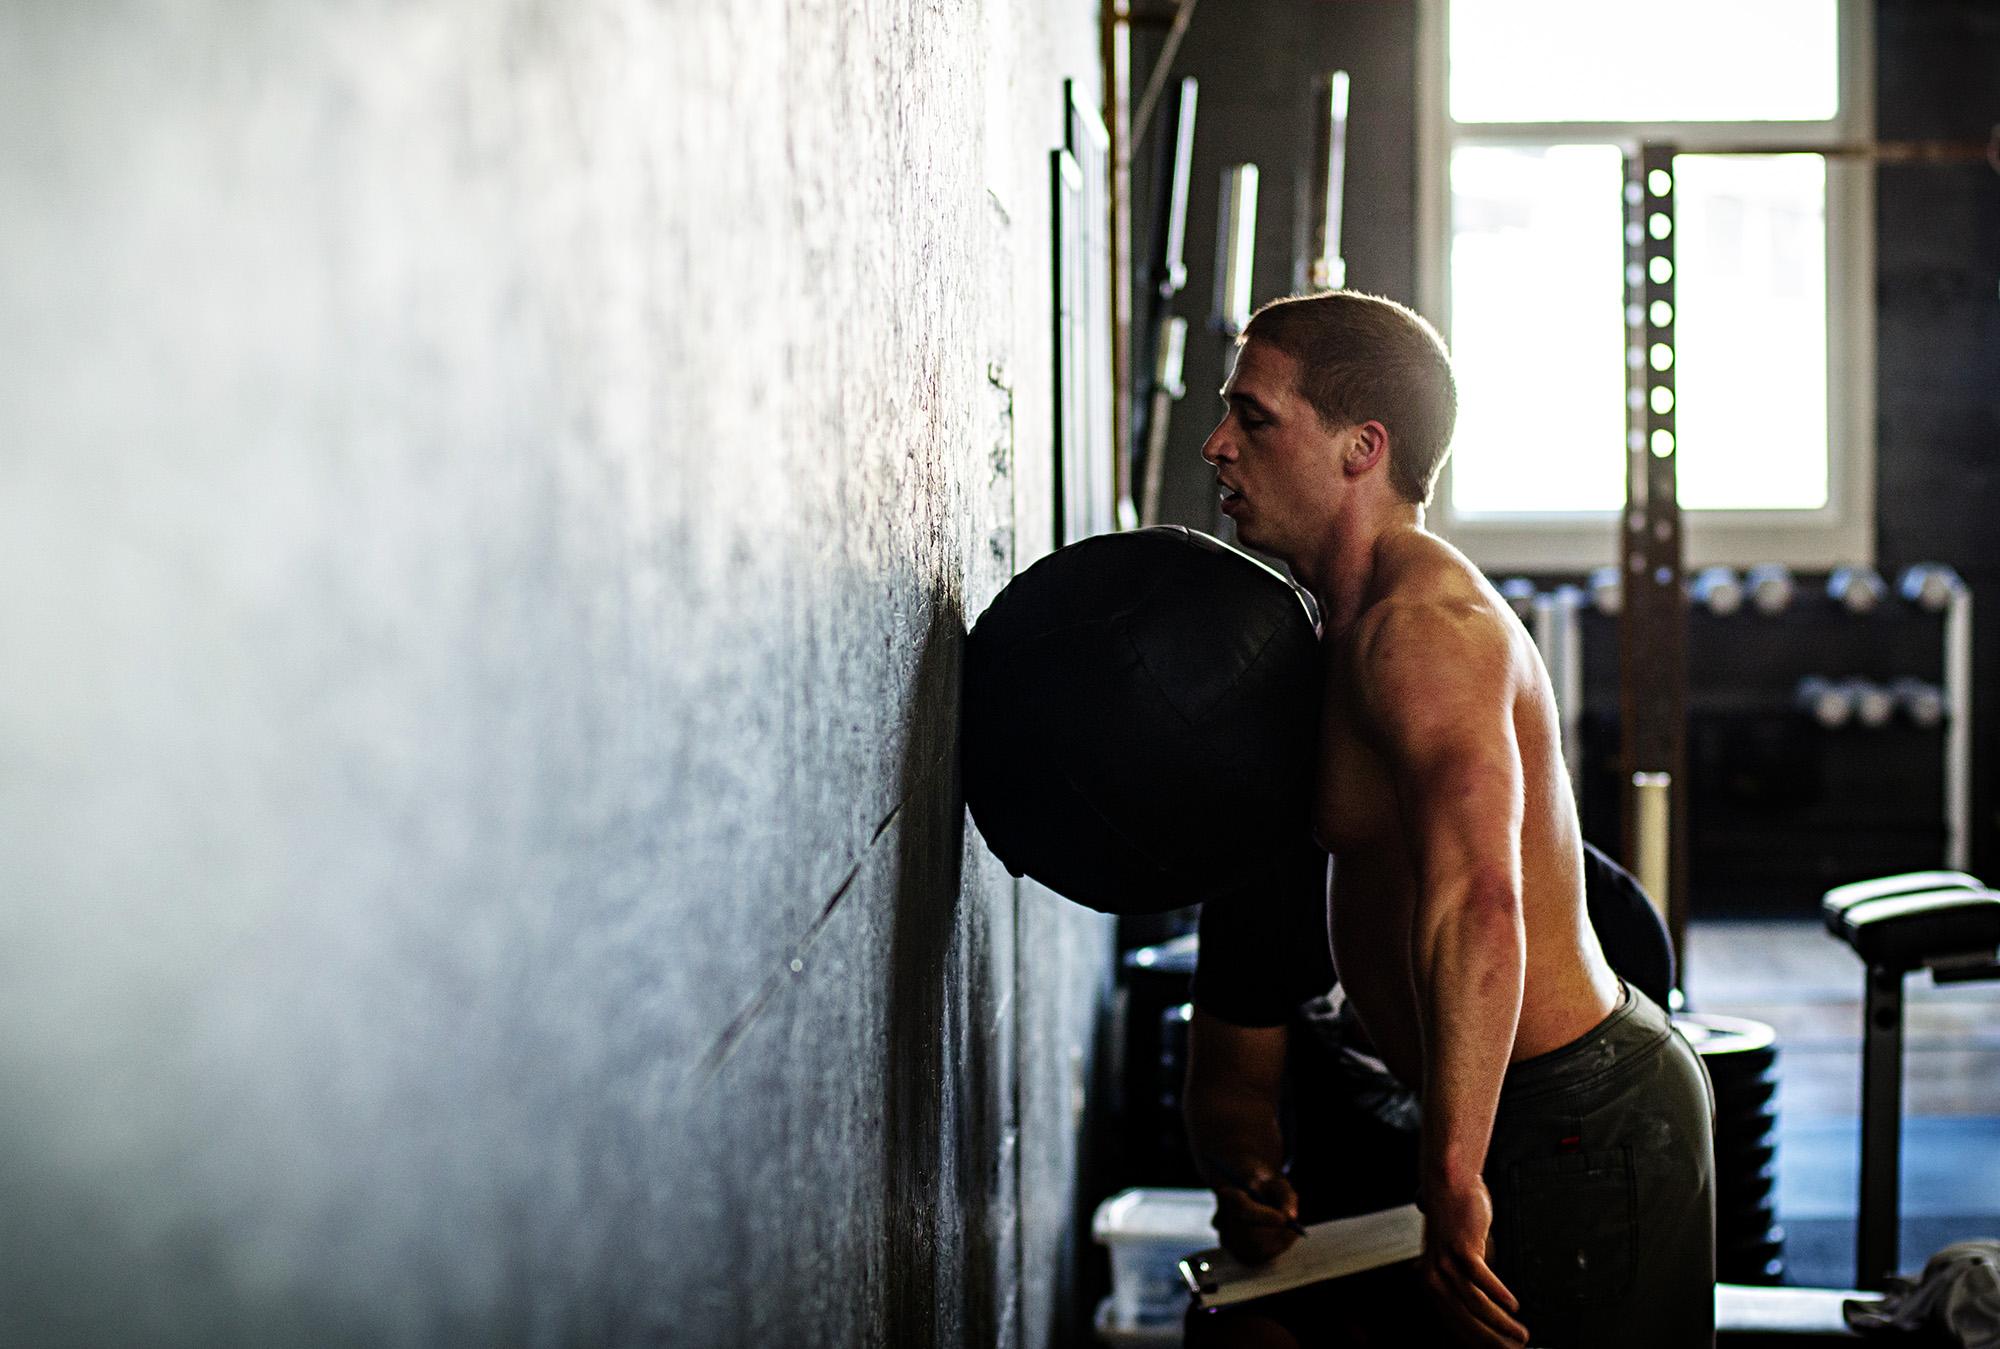 crossfit forging elite fitness wednesday 130403